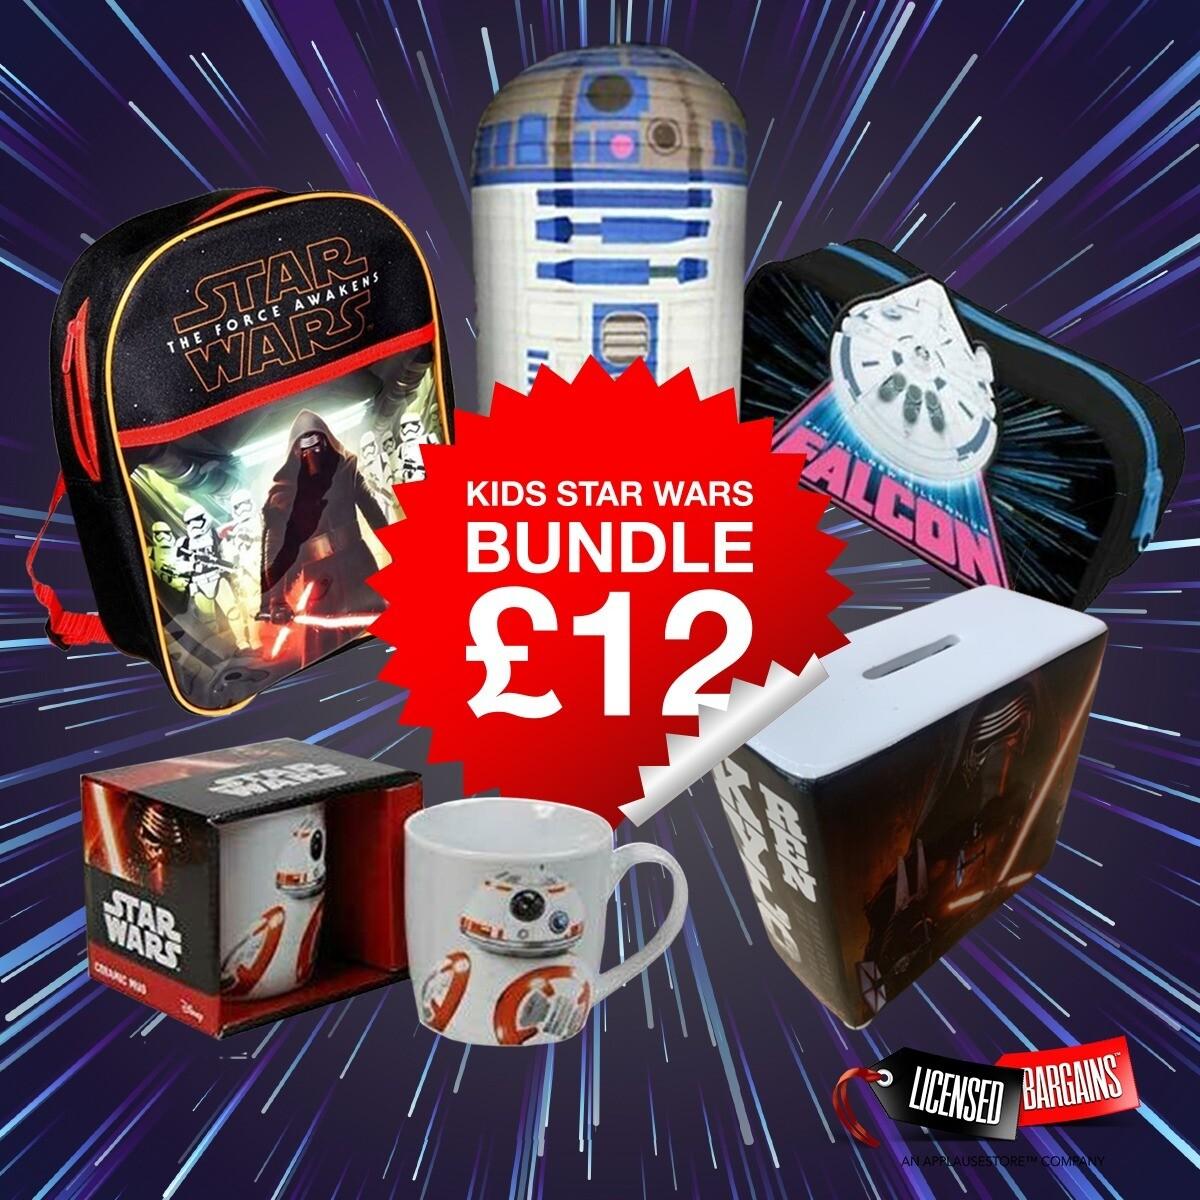 Kids' Star Wars Bundle (age 3-10 suggested)